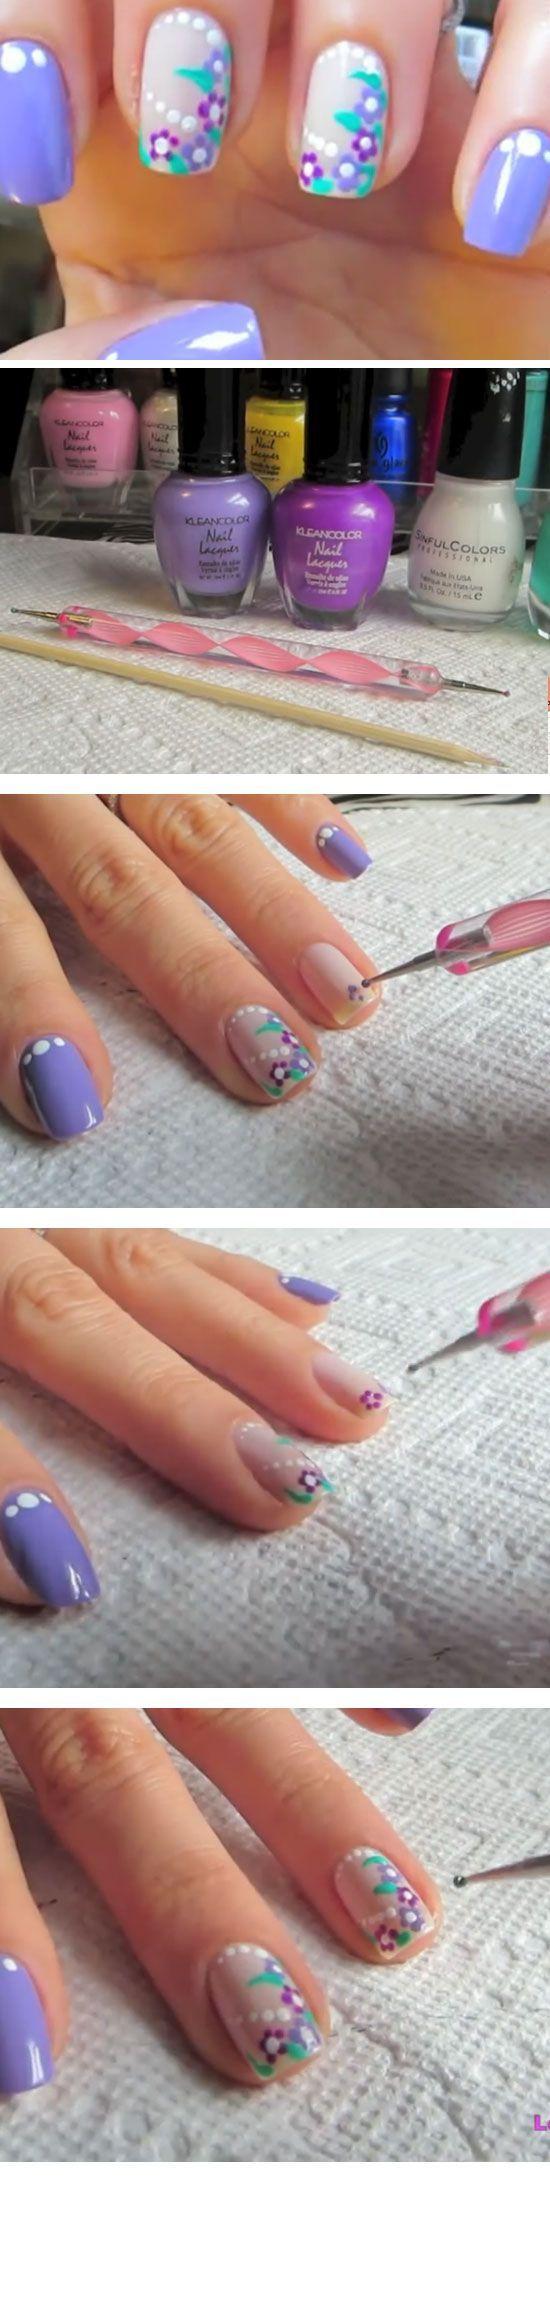 21 Easy Easter Nail Designs for Short Nails | Short nails, Easter ...